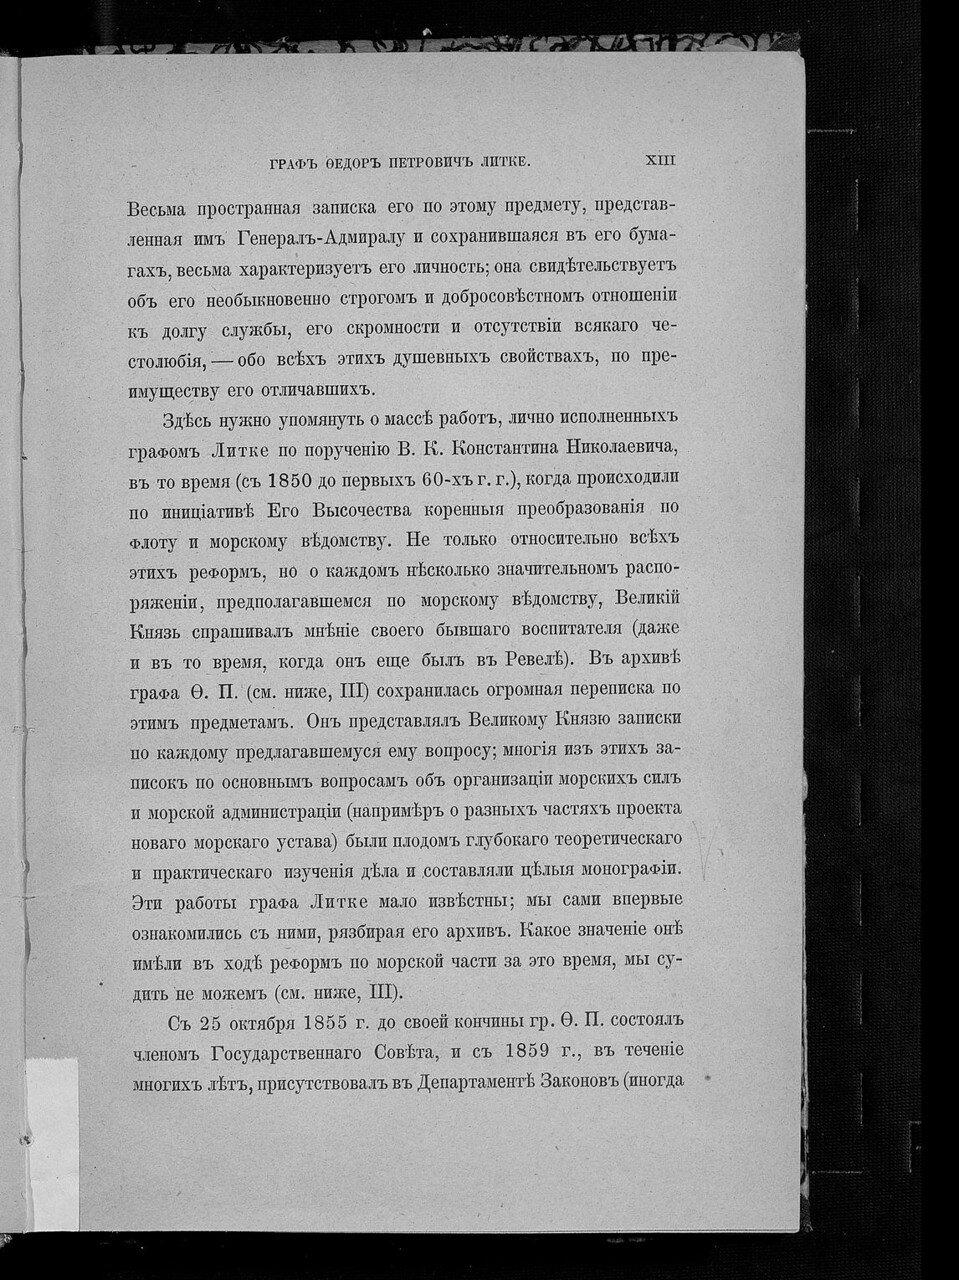 https://img-fotki.yandex.ru/get/27836/199368979.d2/0_21dd5f_f8b79a26_XXXL.jpg